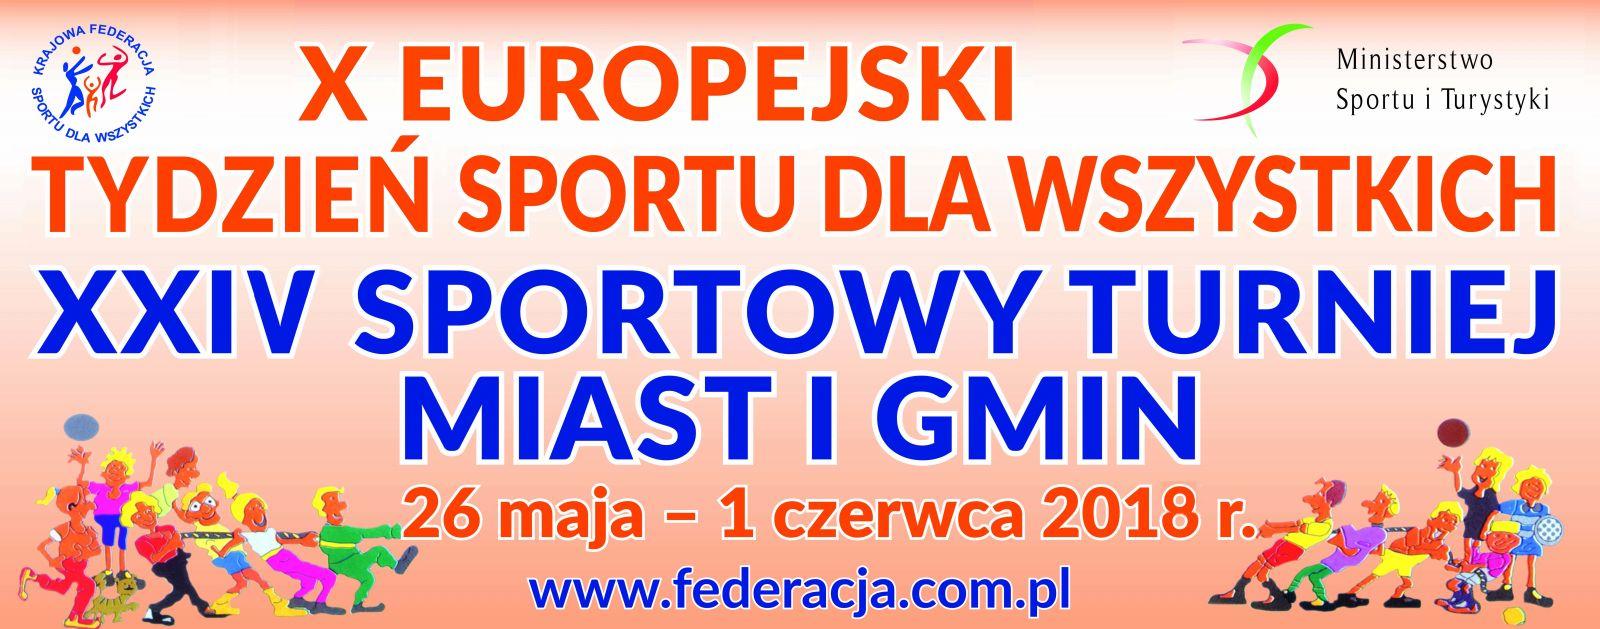 tydzien_sportu.jpg